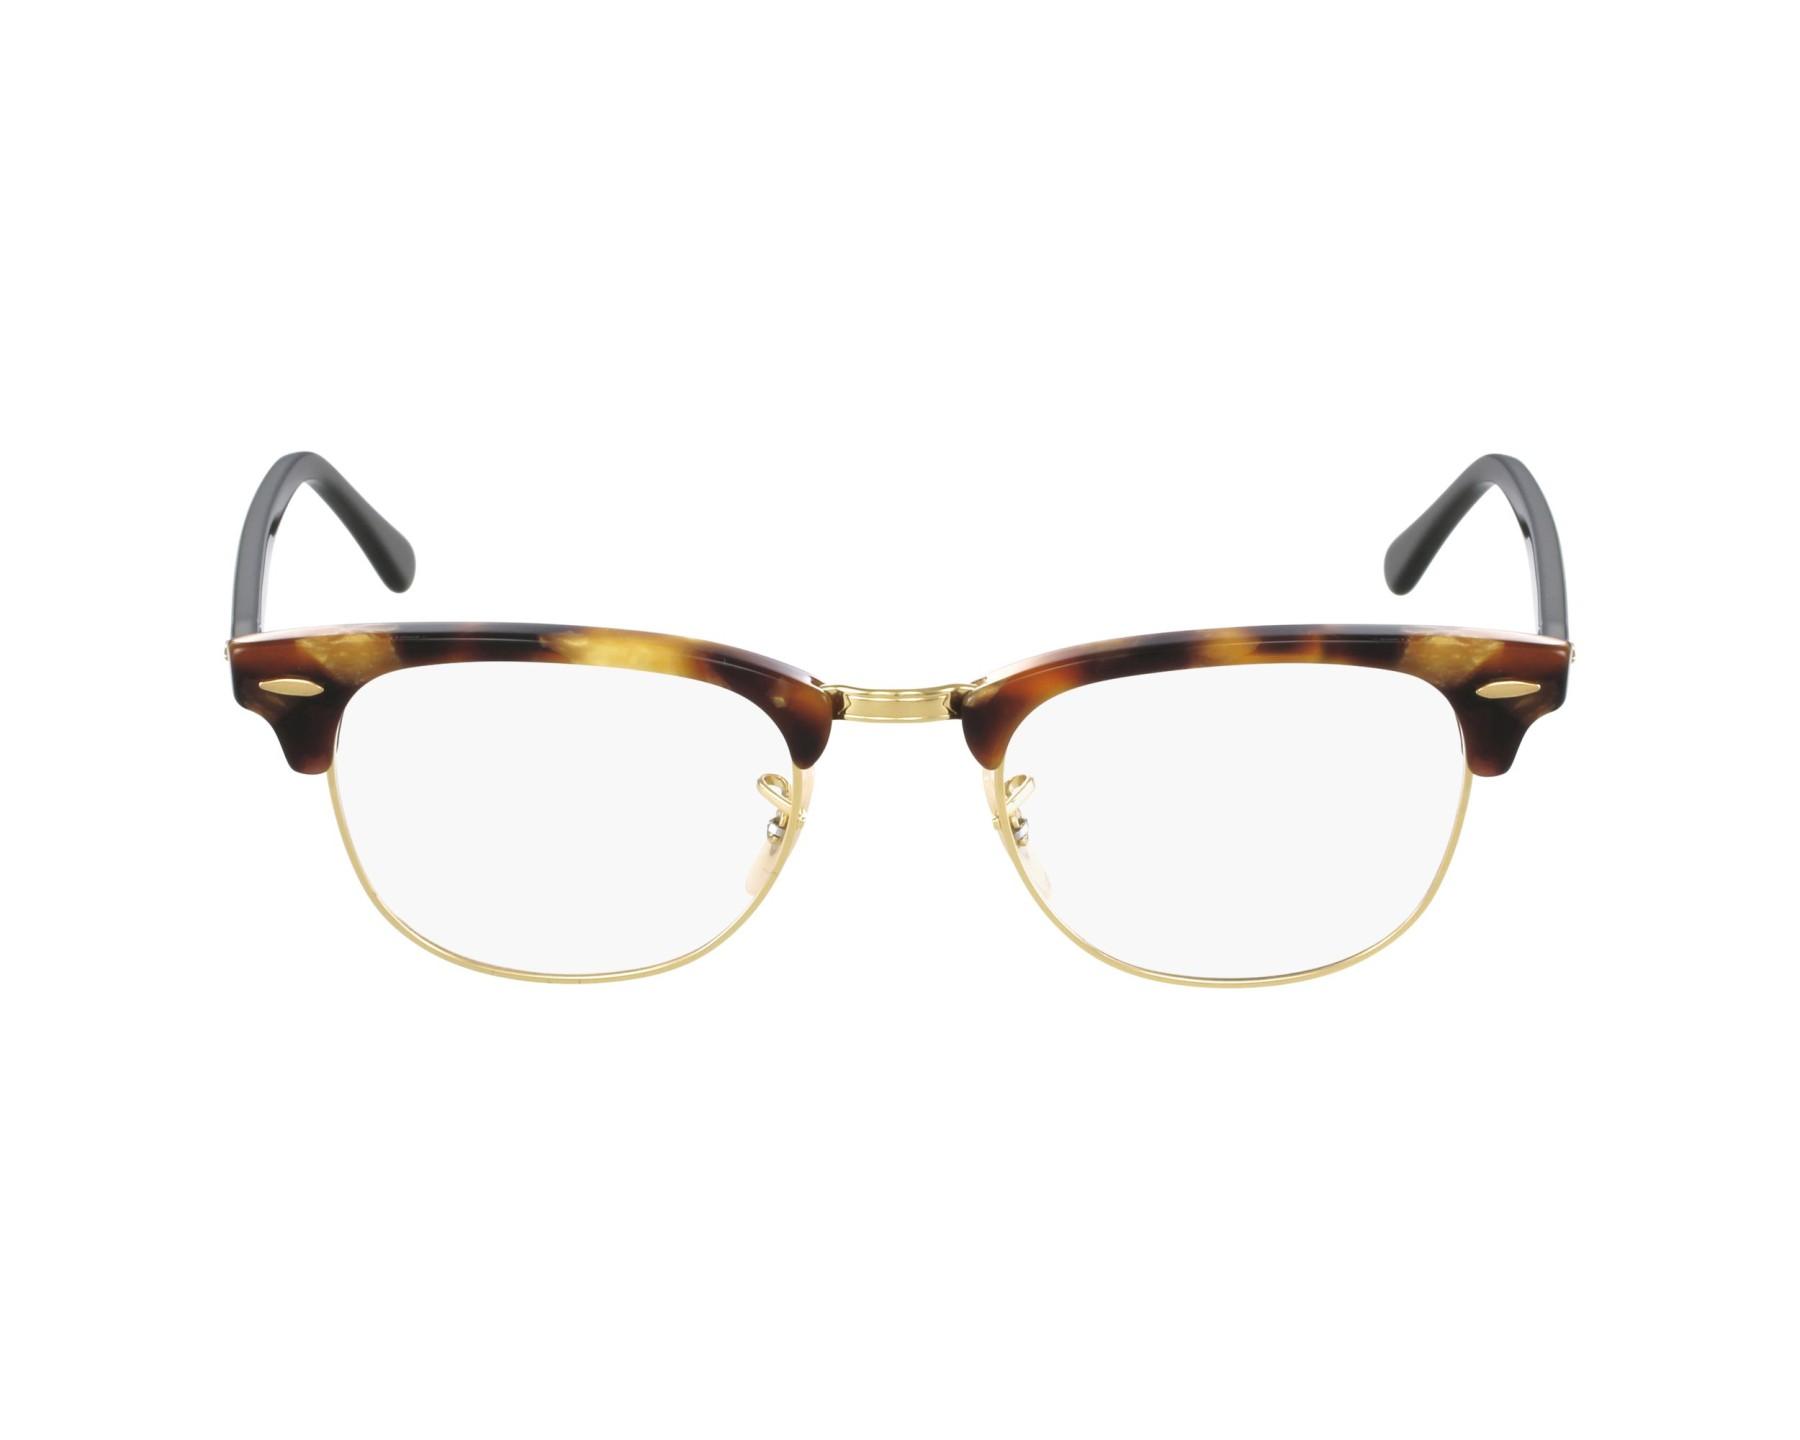 eyeglasses Ray-Ban RX-5154 5494 49-21 Havana Gold profile view 42f3bf0d60d